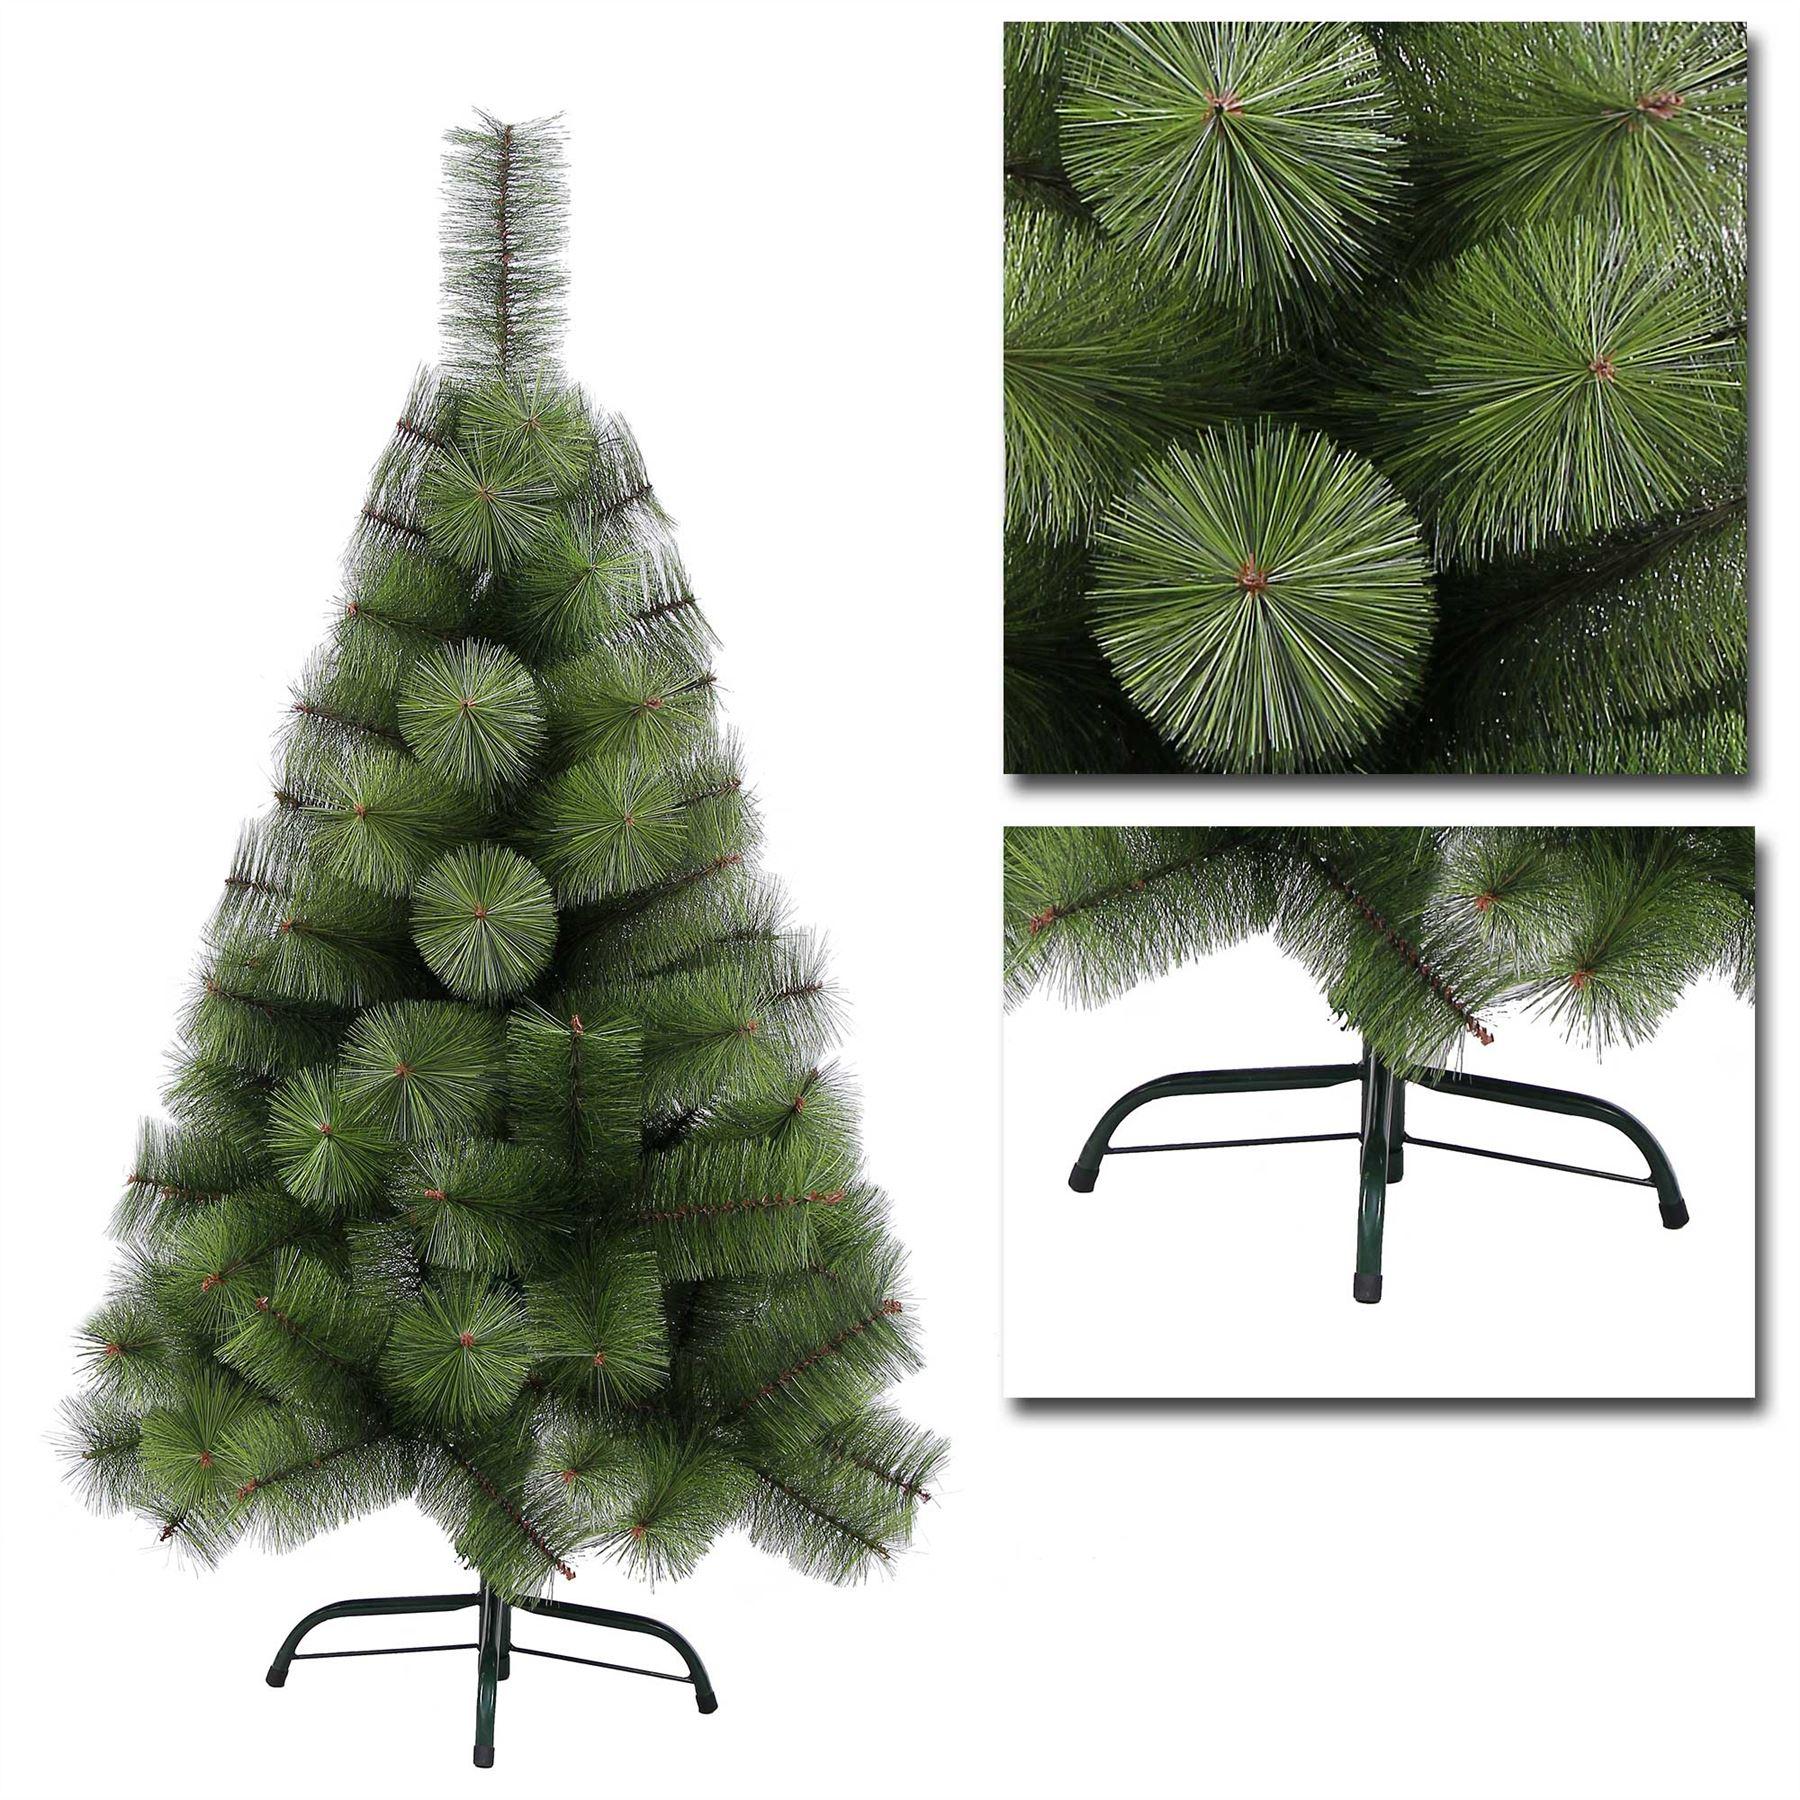 Ebay Christmas Tree: Deluxe Bushy Classic Christmas Tree Xmas Home Decorations